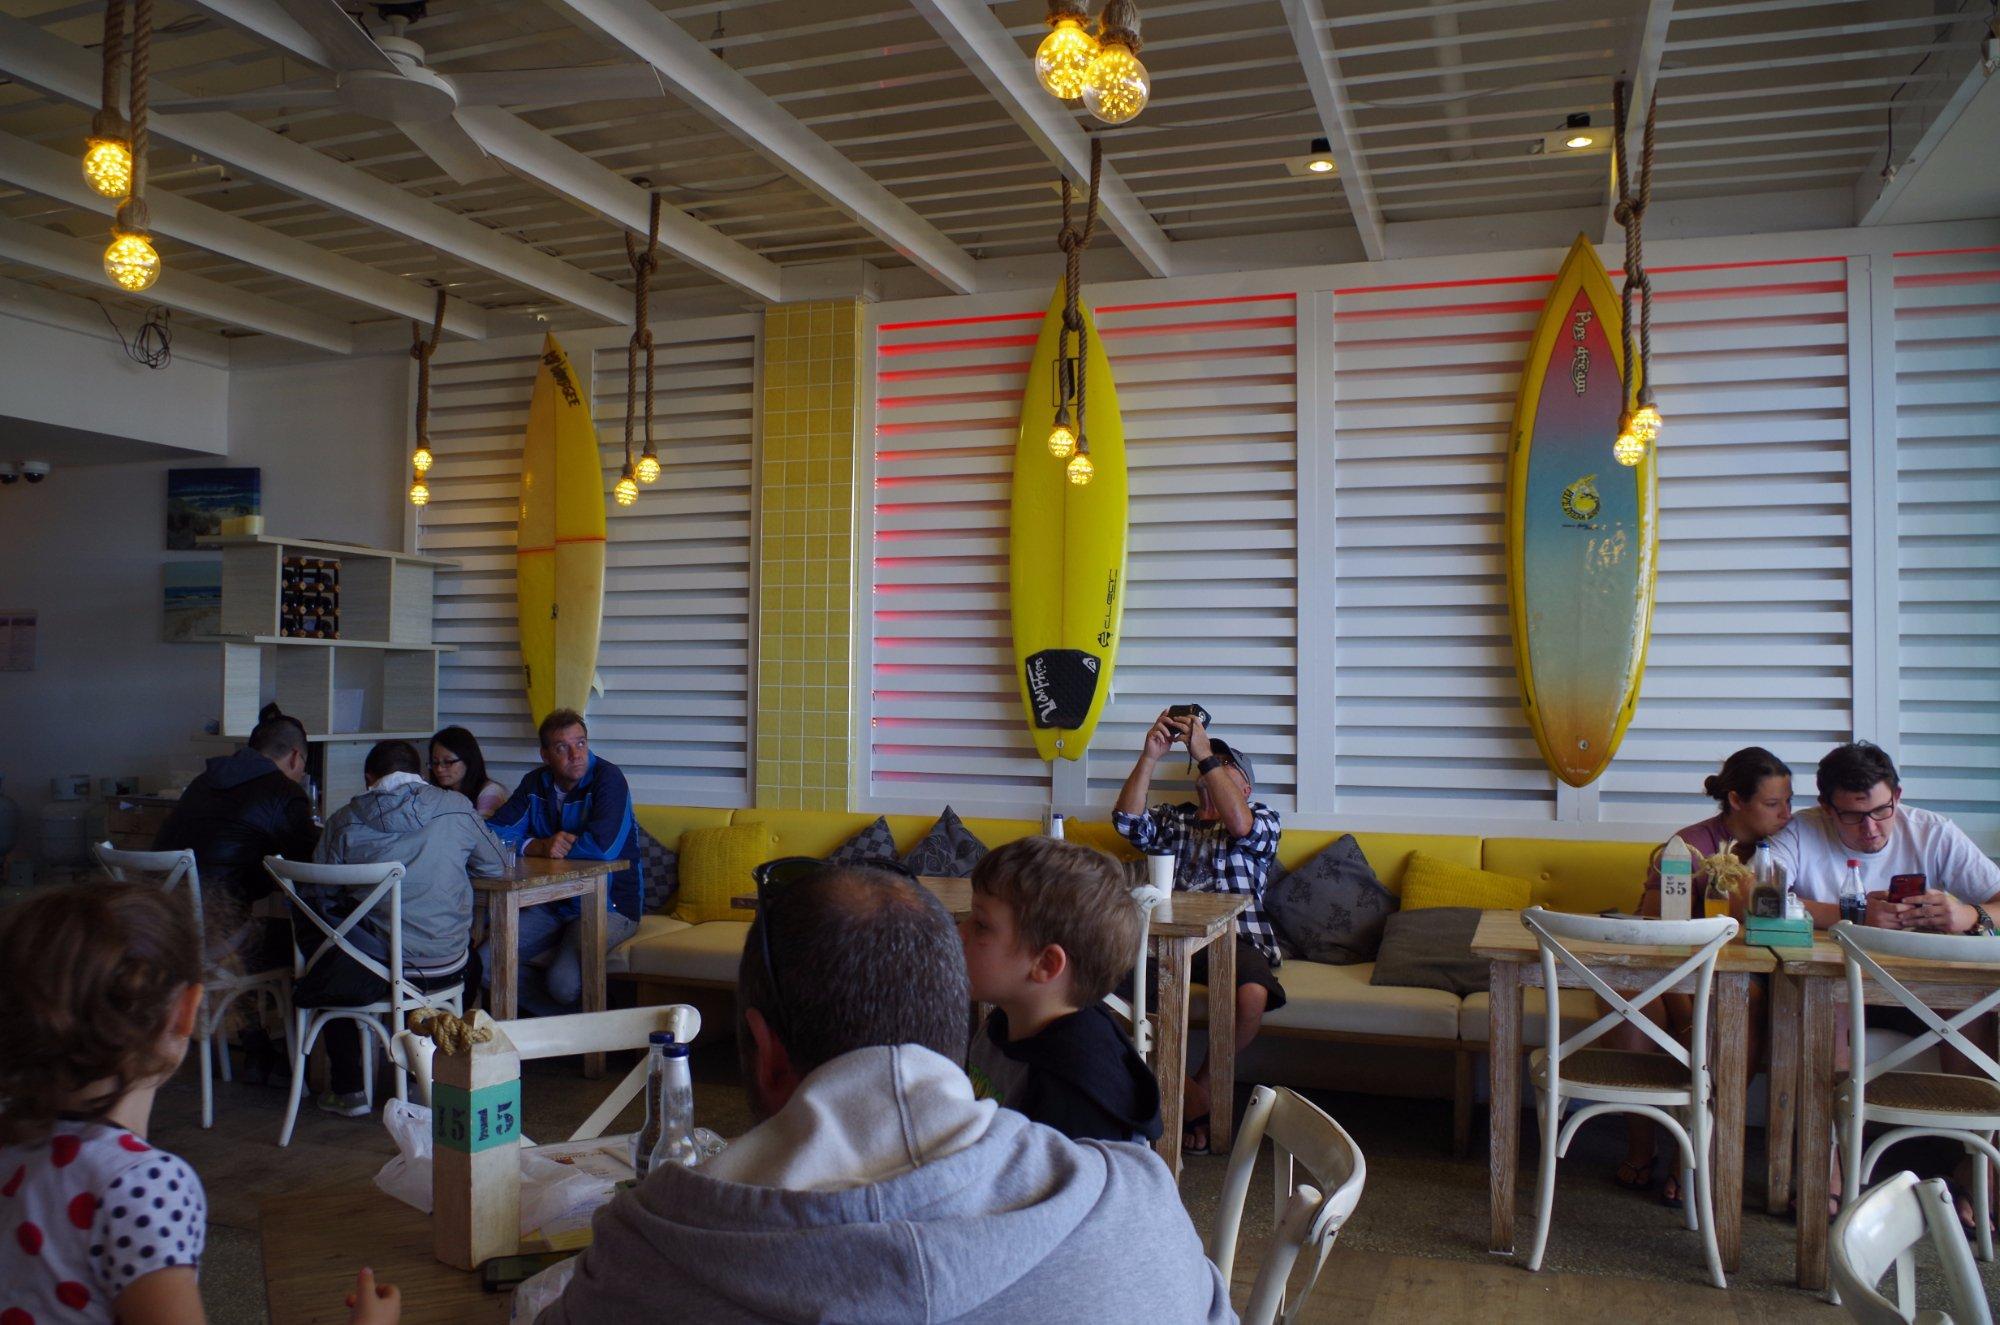 The Surfers Paradise Beach Cafe   Soul Boardwalk, 4 The Esplanade, QLD, Surfers Paradise, Gold Coast, Surfers Paradise, Queensland 4217   +61 7 5527 6183